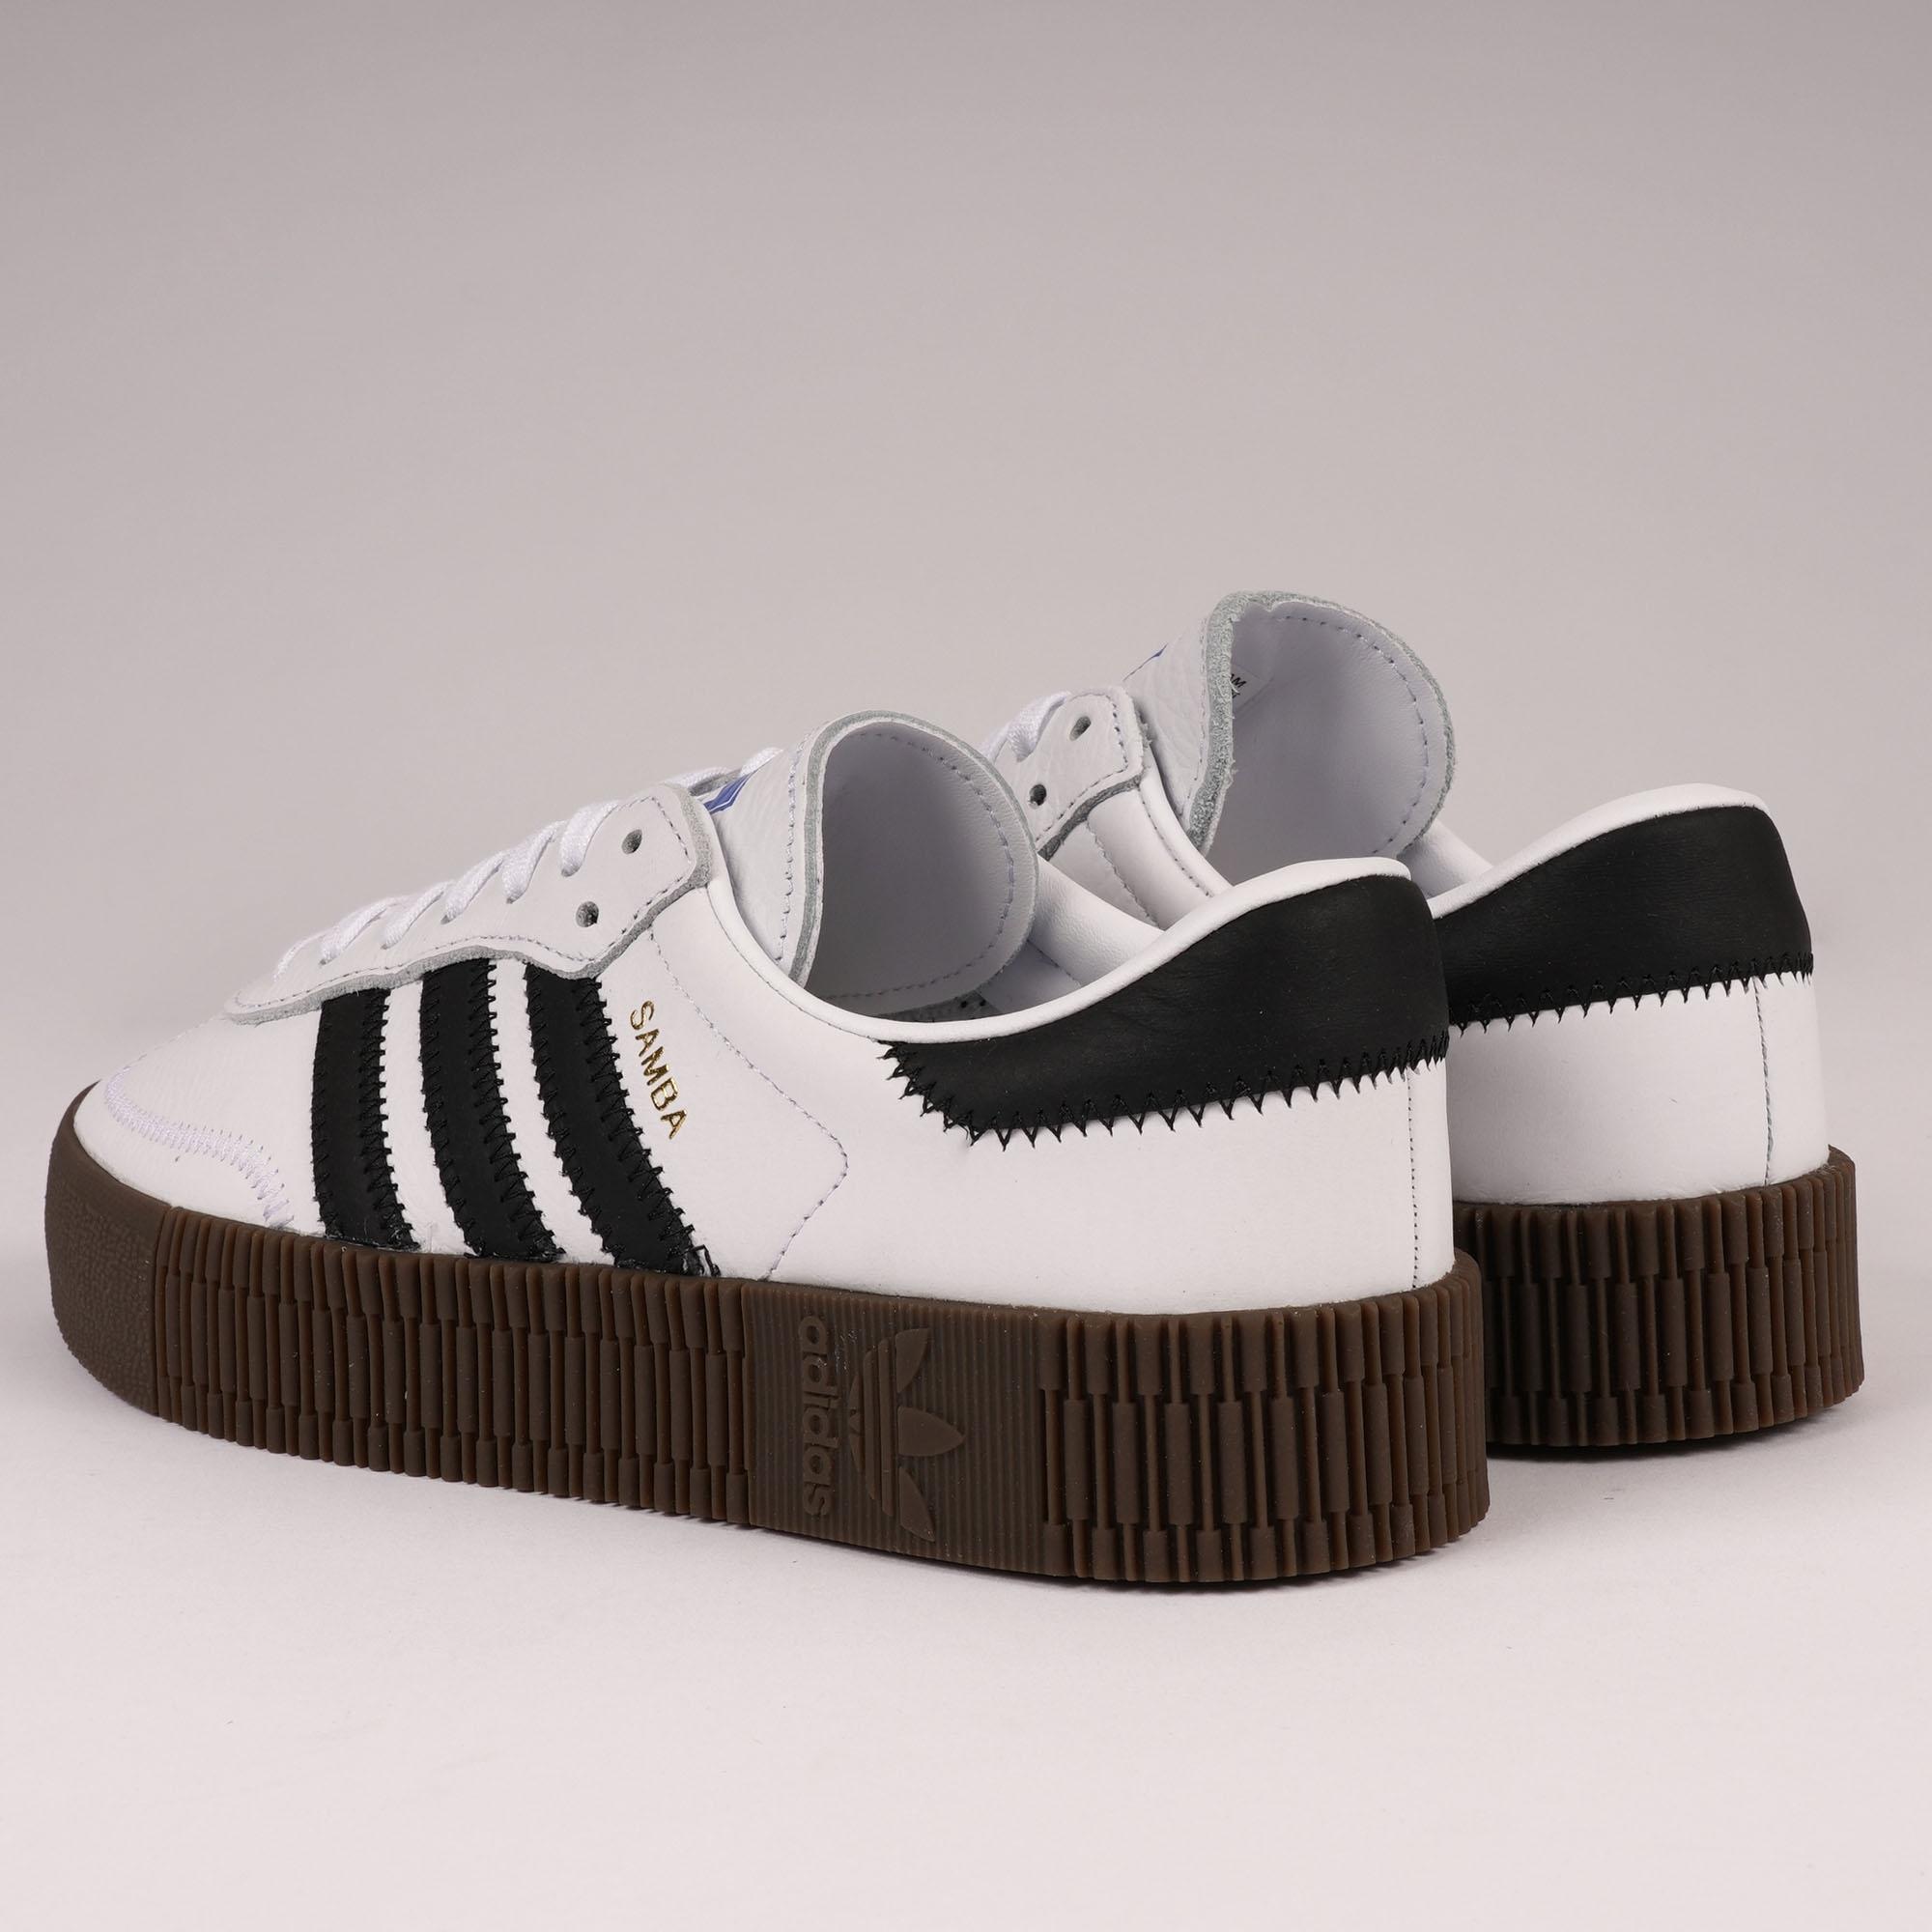 new styles 0a173 a0a71 Sambarose - FTWR White, Core Black  amp  ...